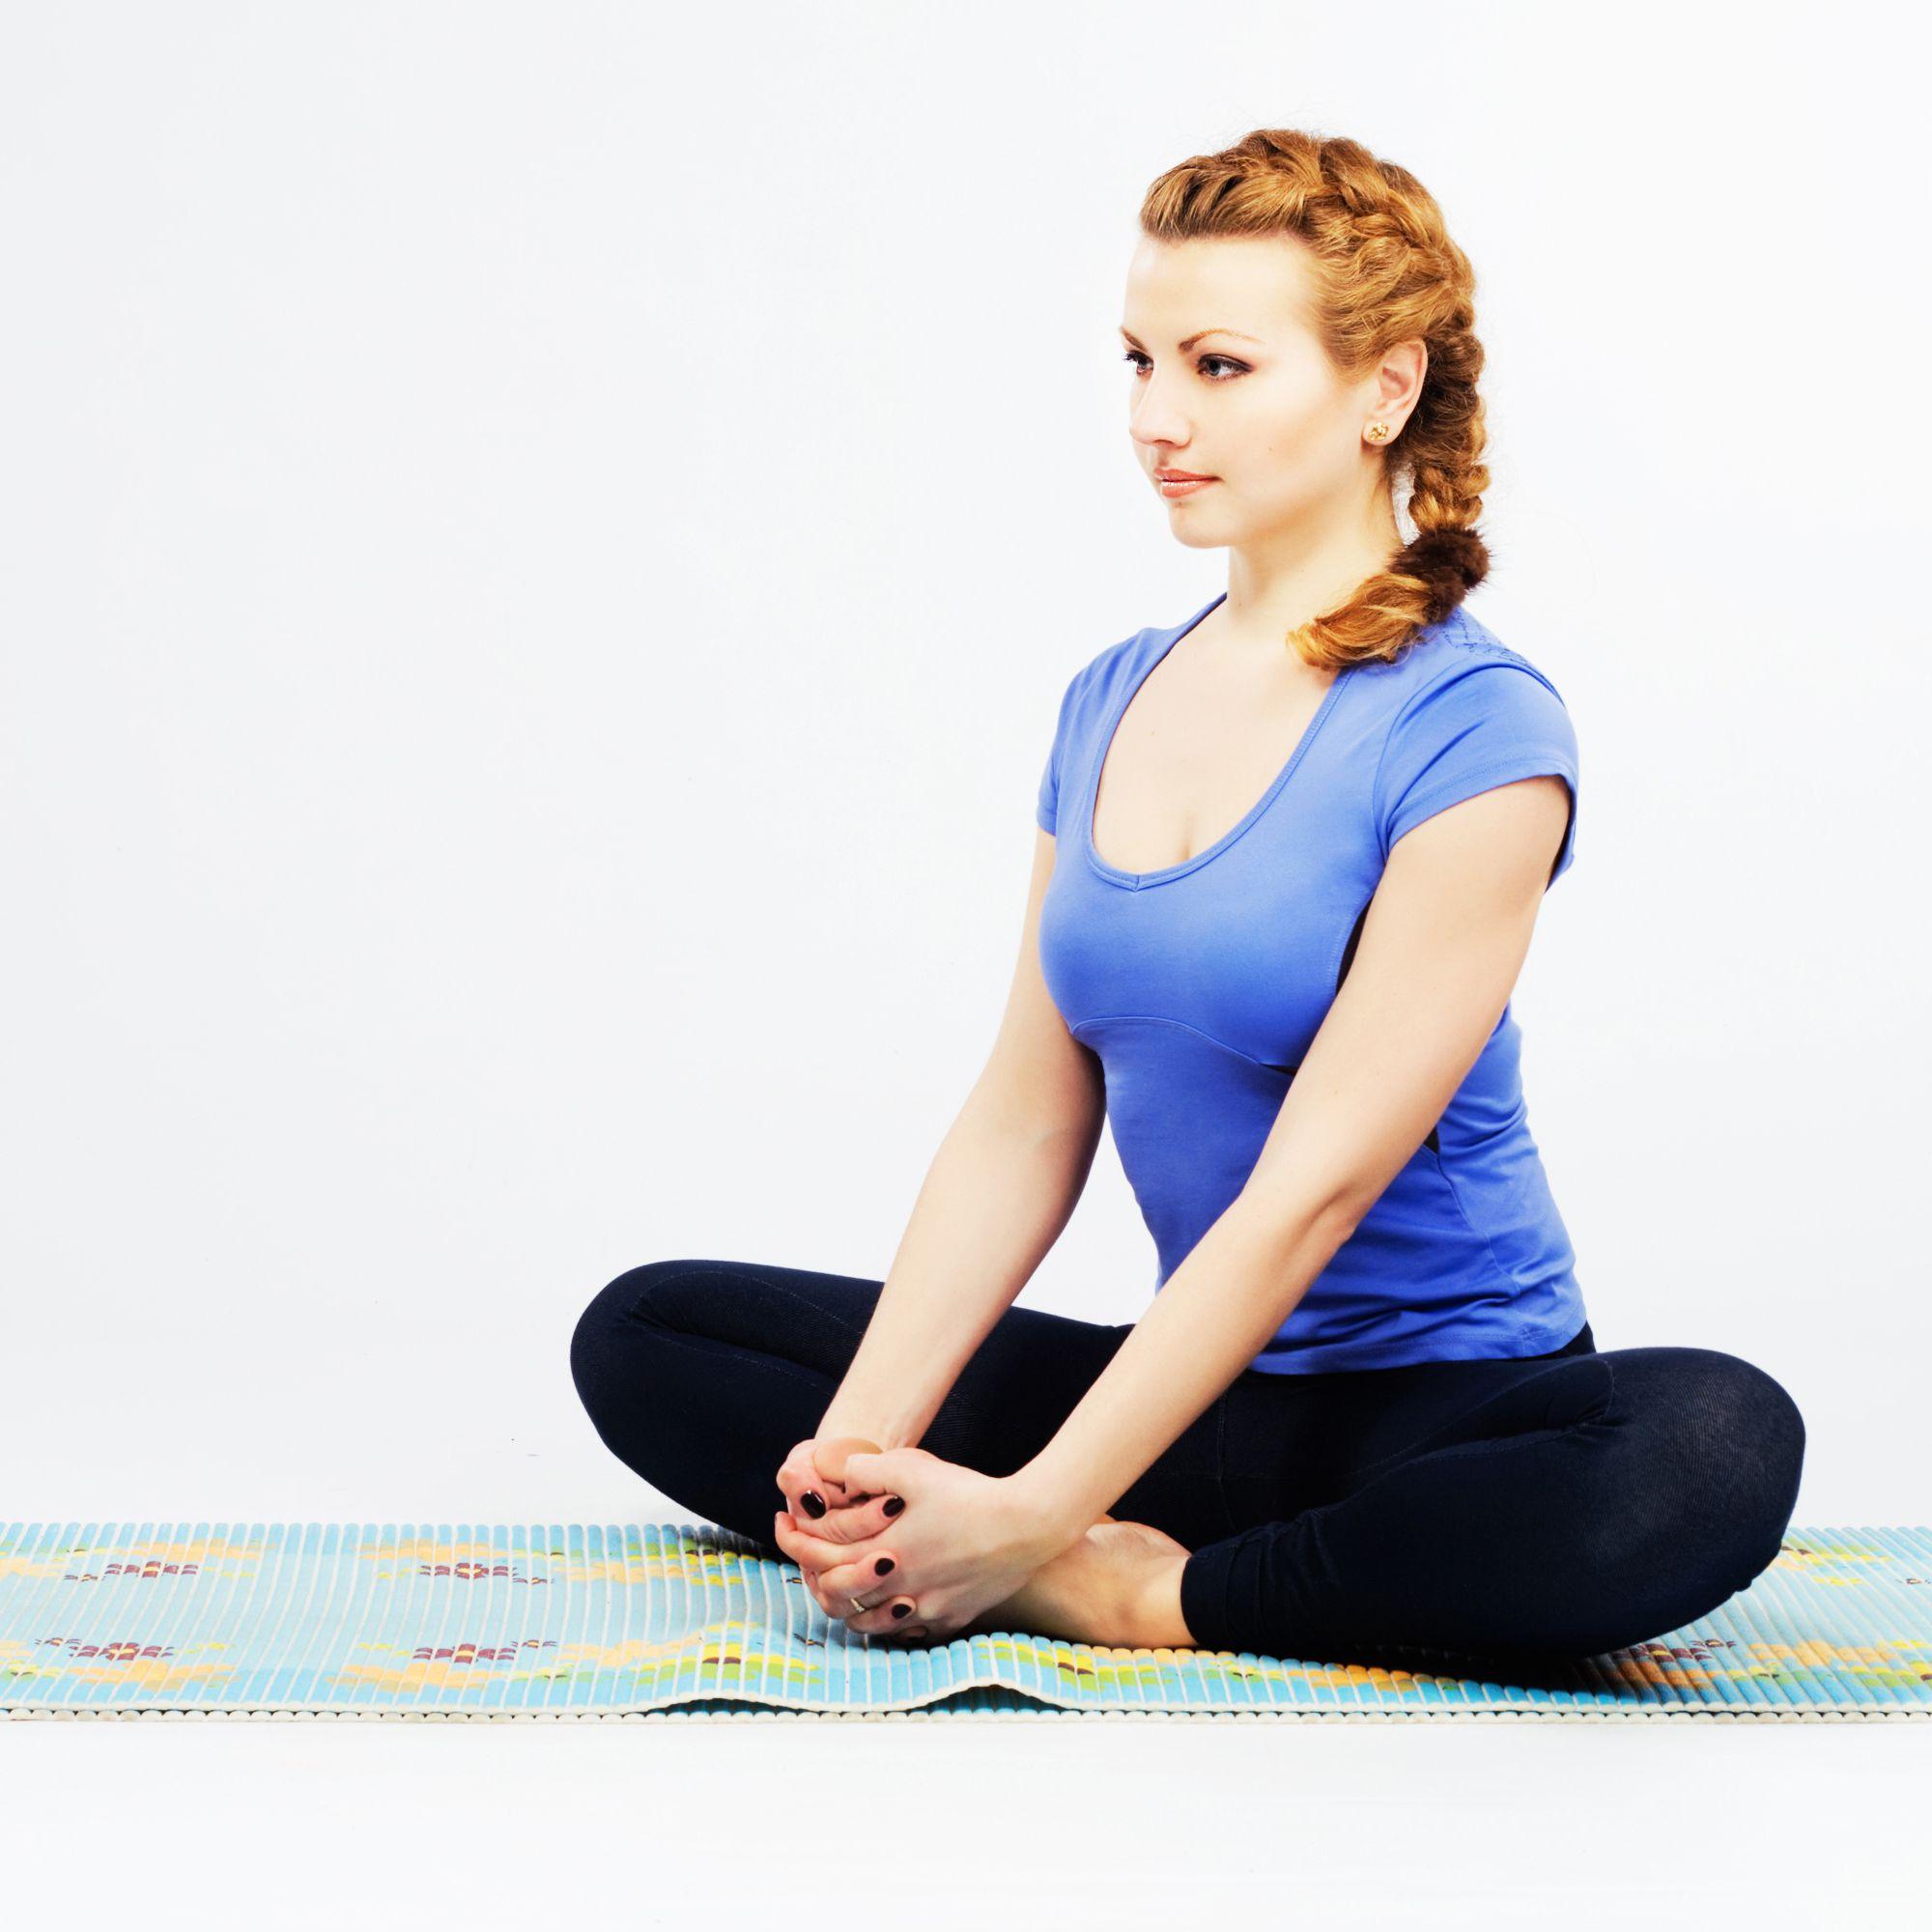 Thigh Stretches That Focus on Groin Flexibility